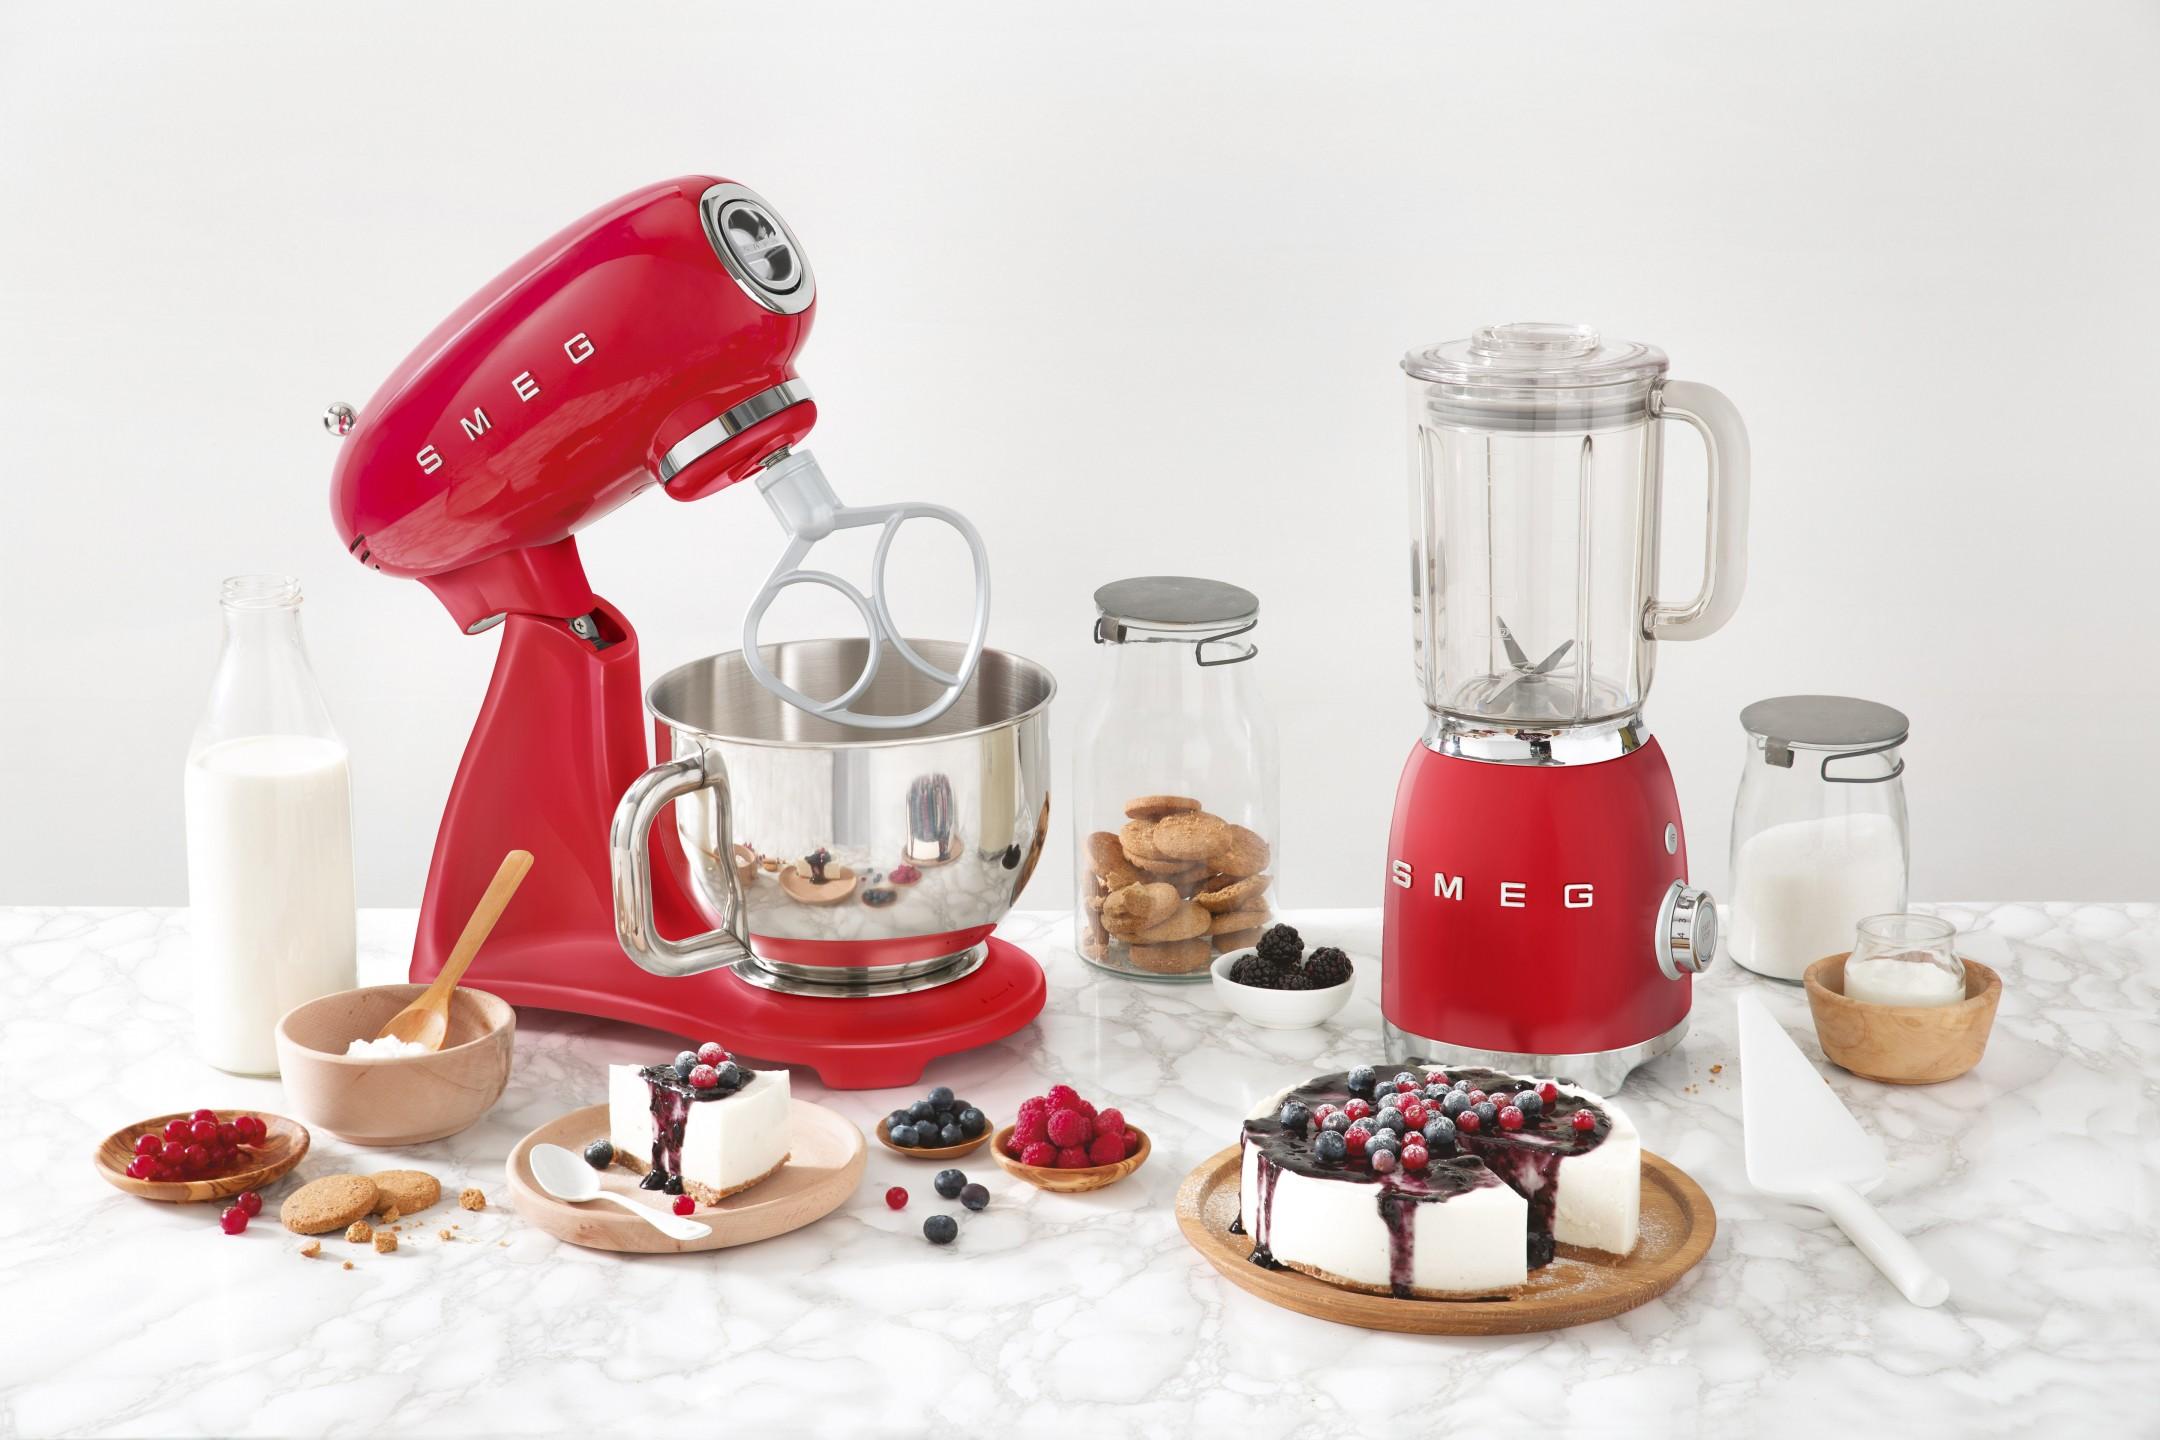 squarerooms smeg blender stand mixer red kitchen appliances lifestyle